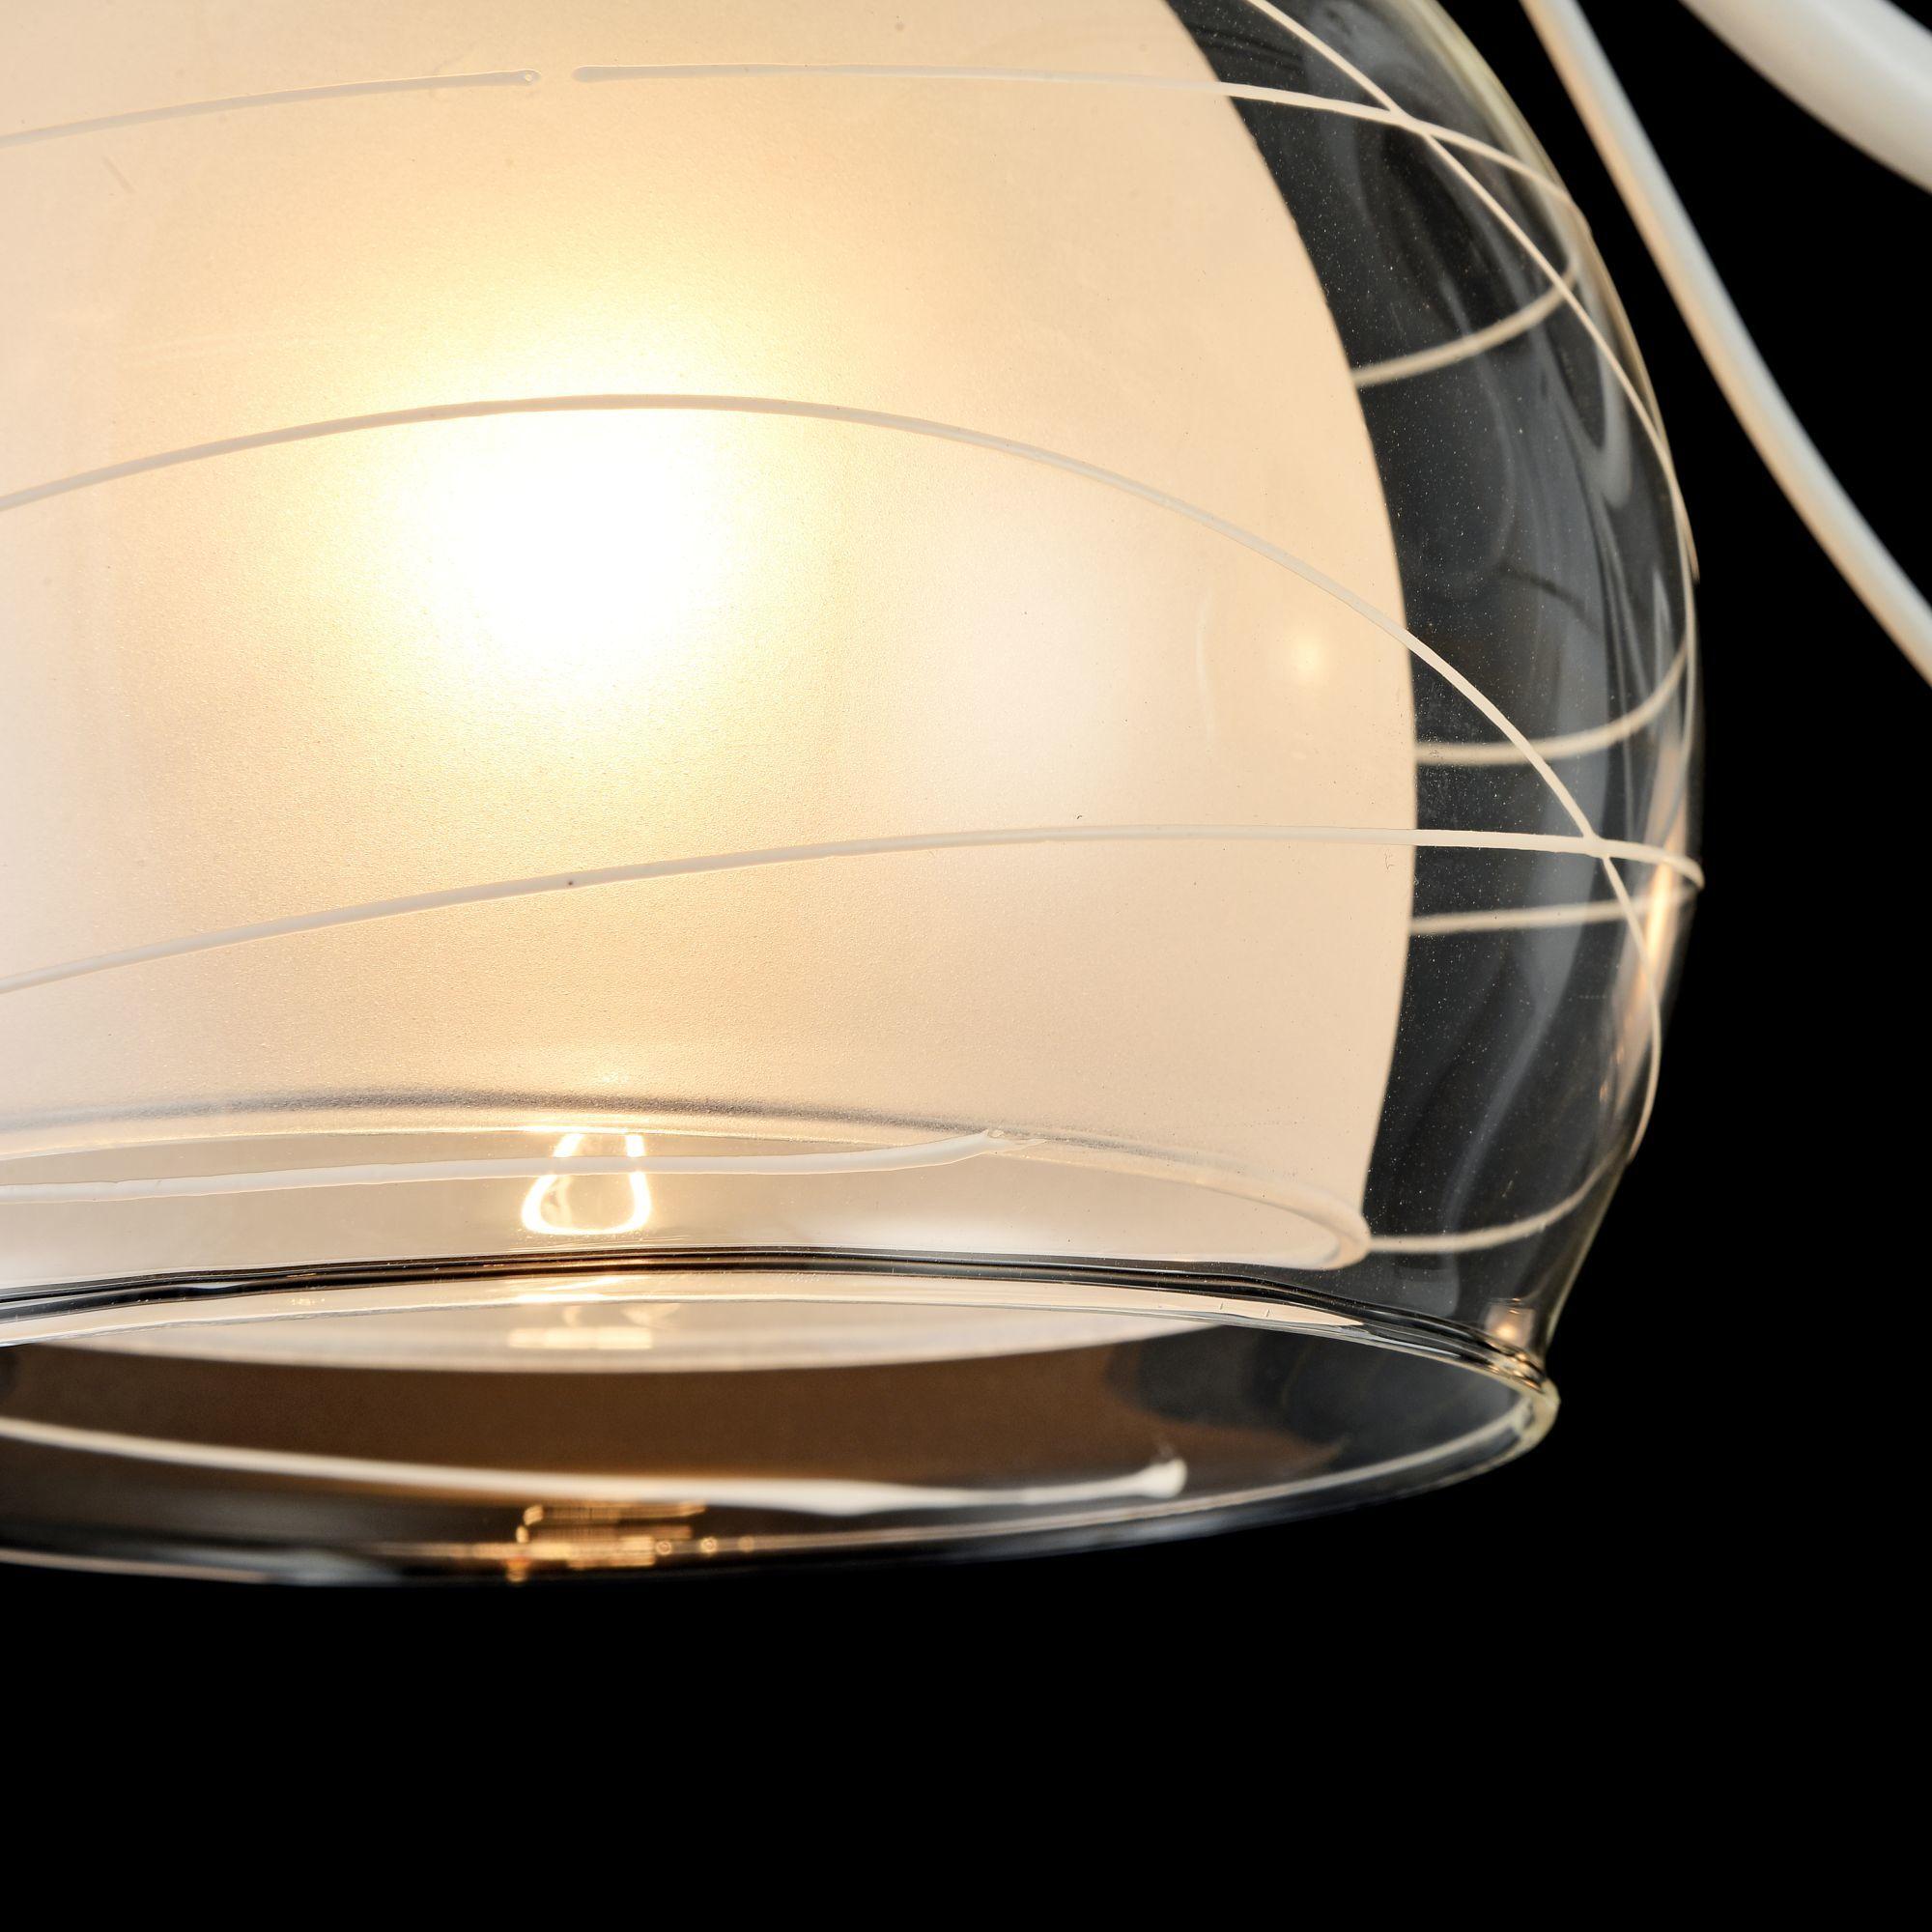 Потолочная люстра Freya Nikki FR5052-CL-03-W, 3xE14x60W, белый с никелем, белый с прозрачным, прозрачный с белым, металл, стекло - фото 5